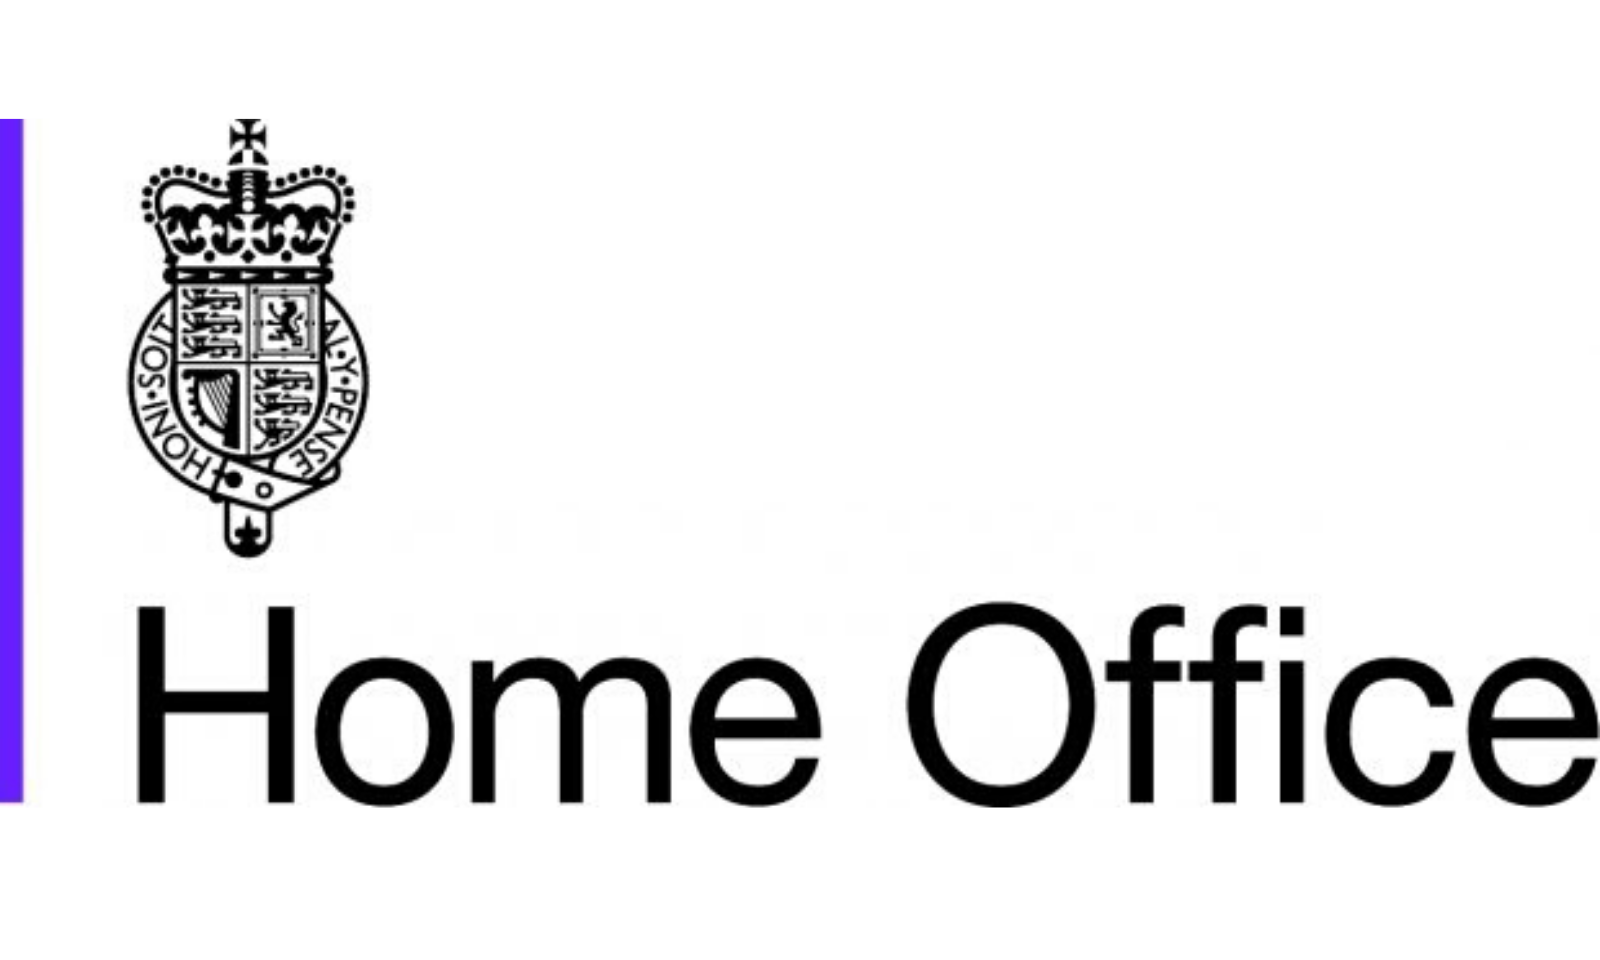 Home Office logo.